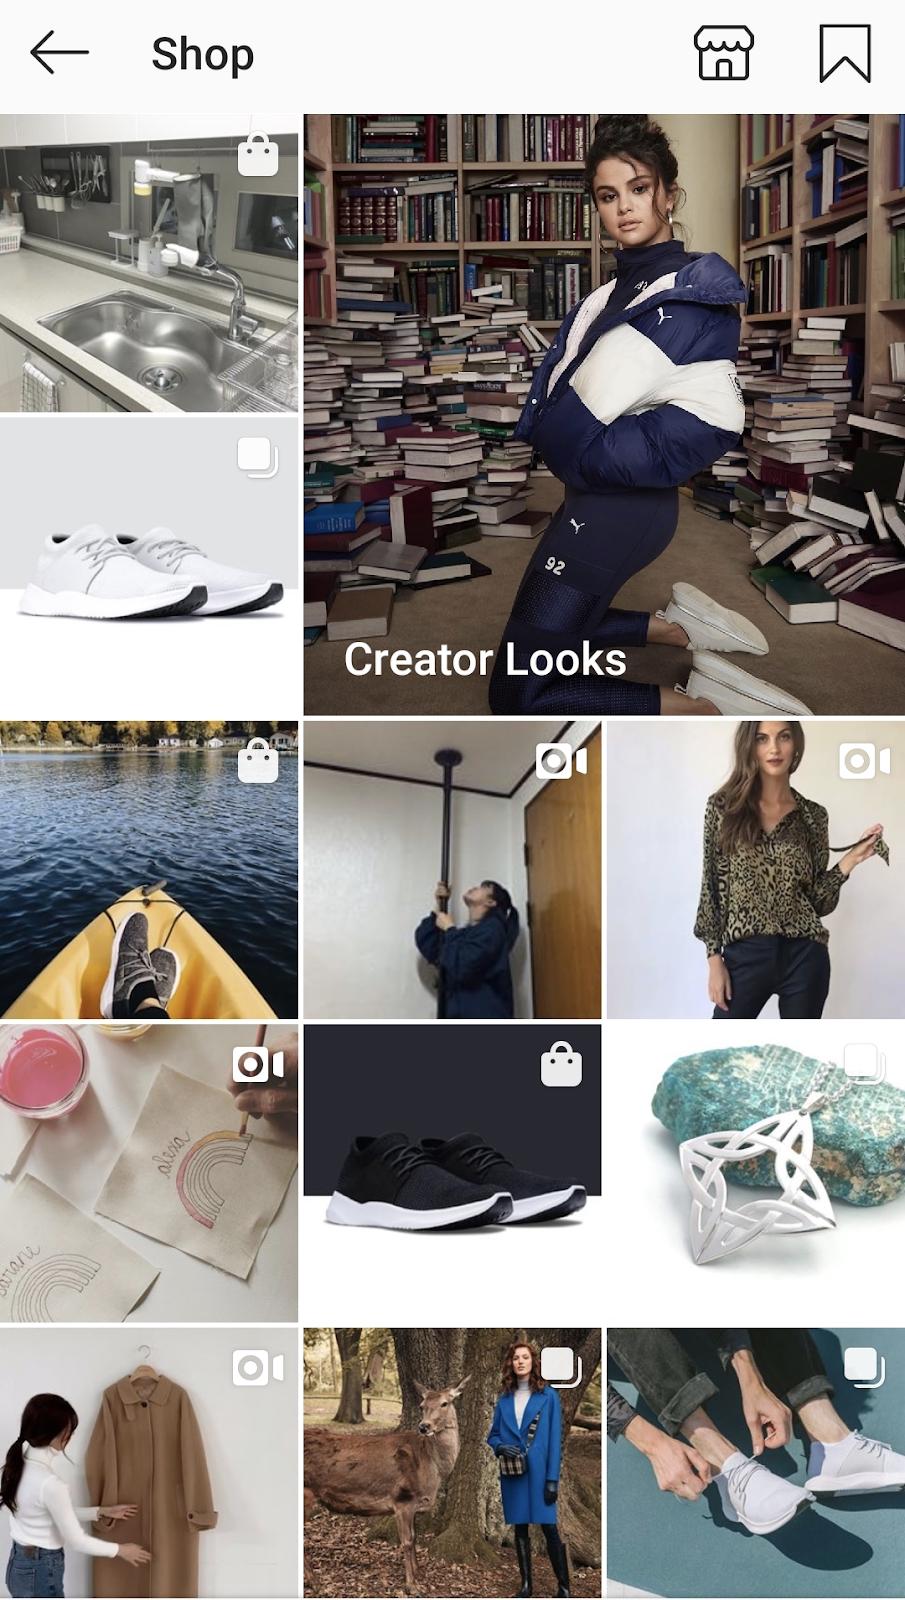 Explore Shop in Instagram.